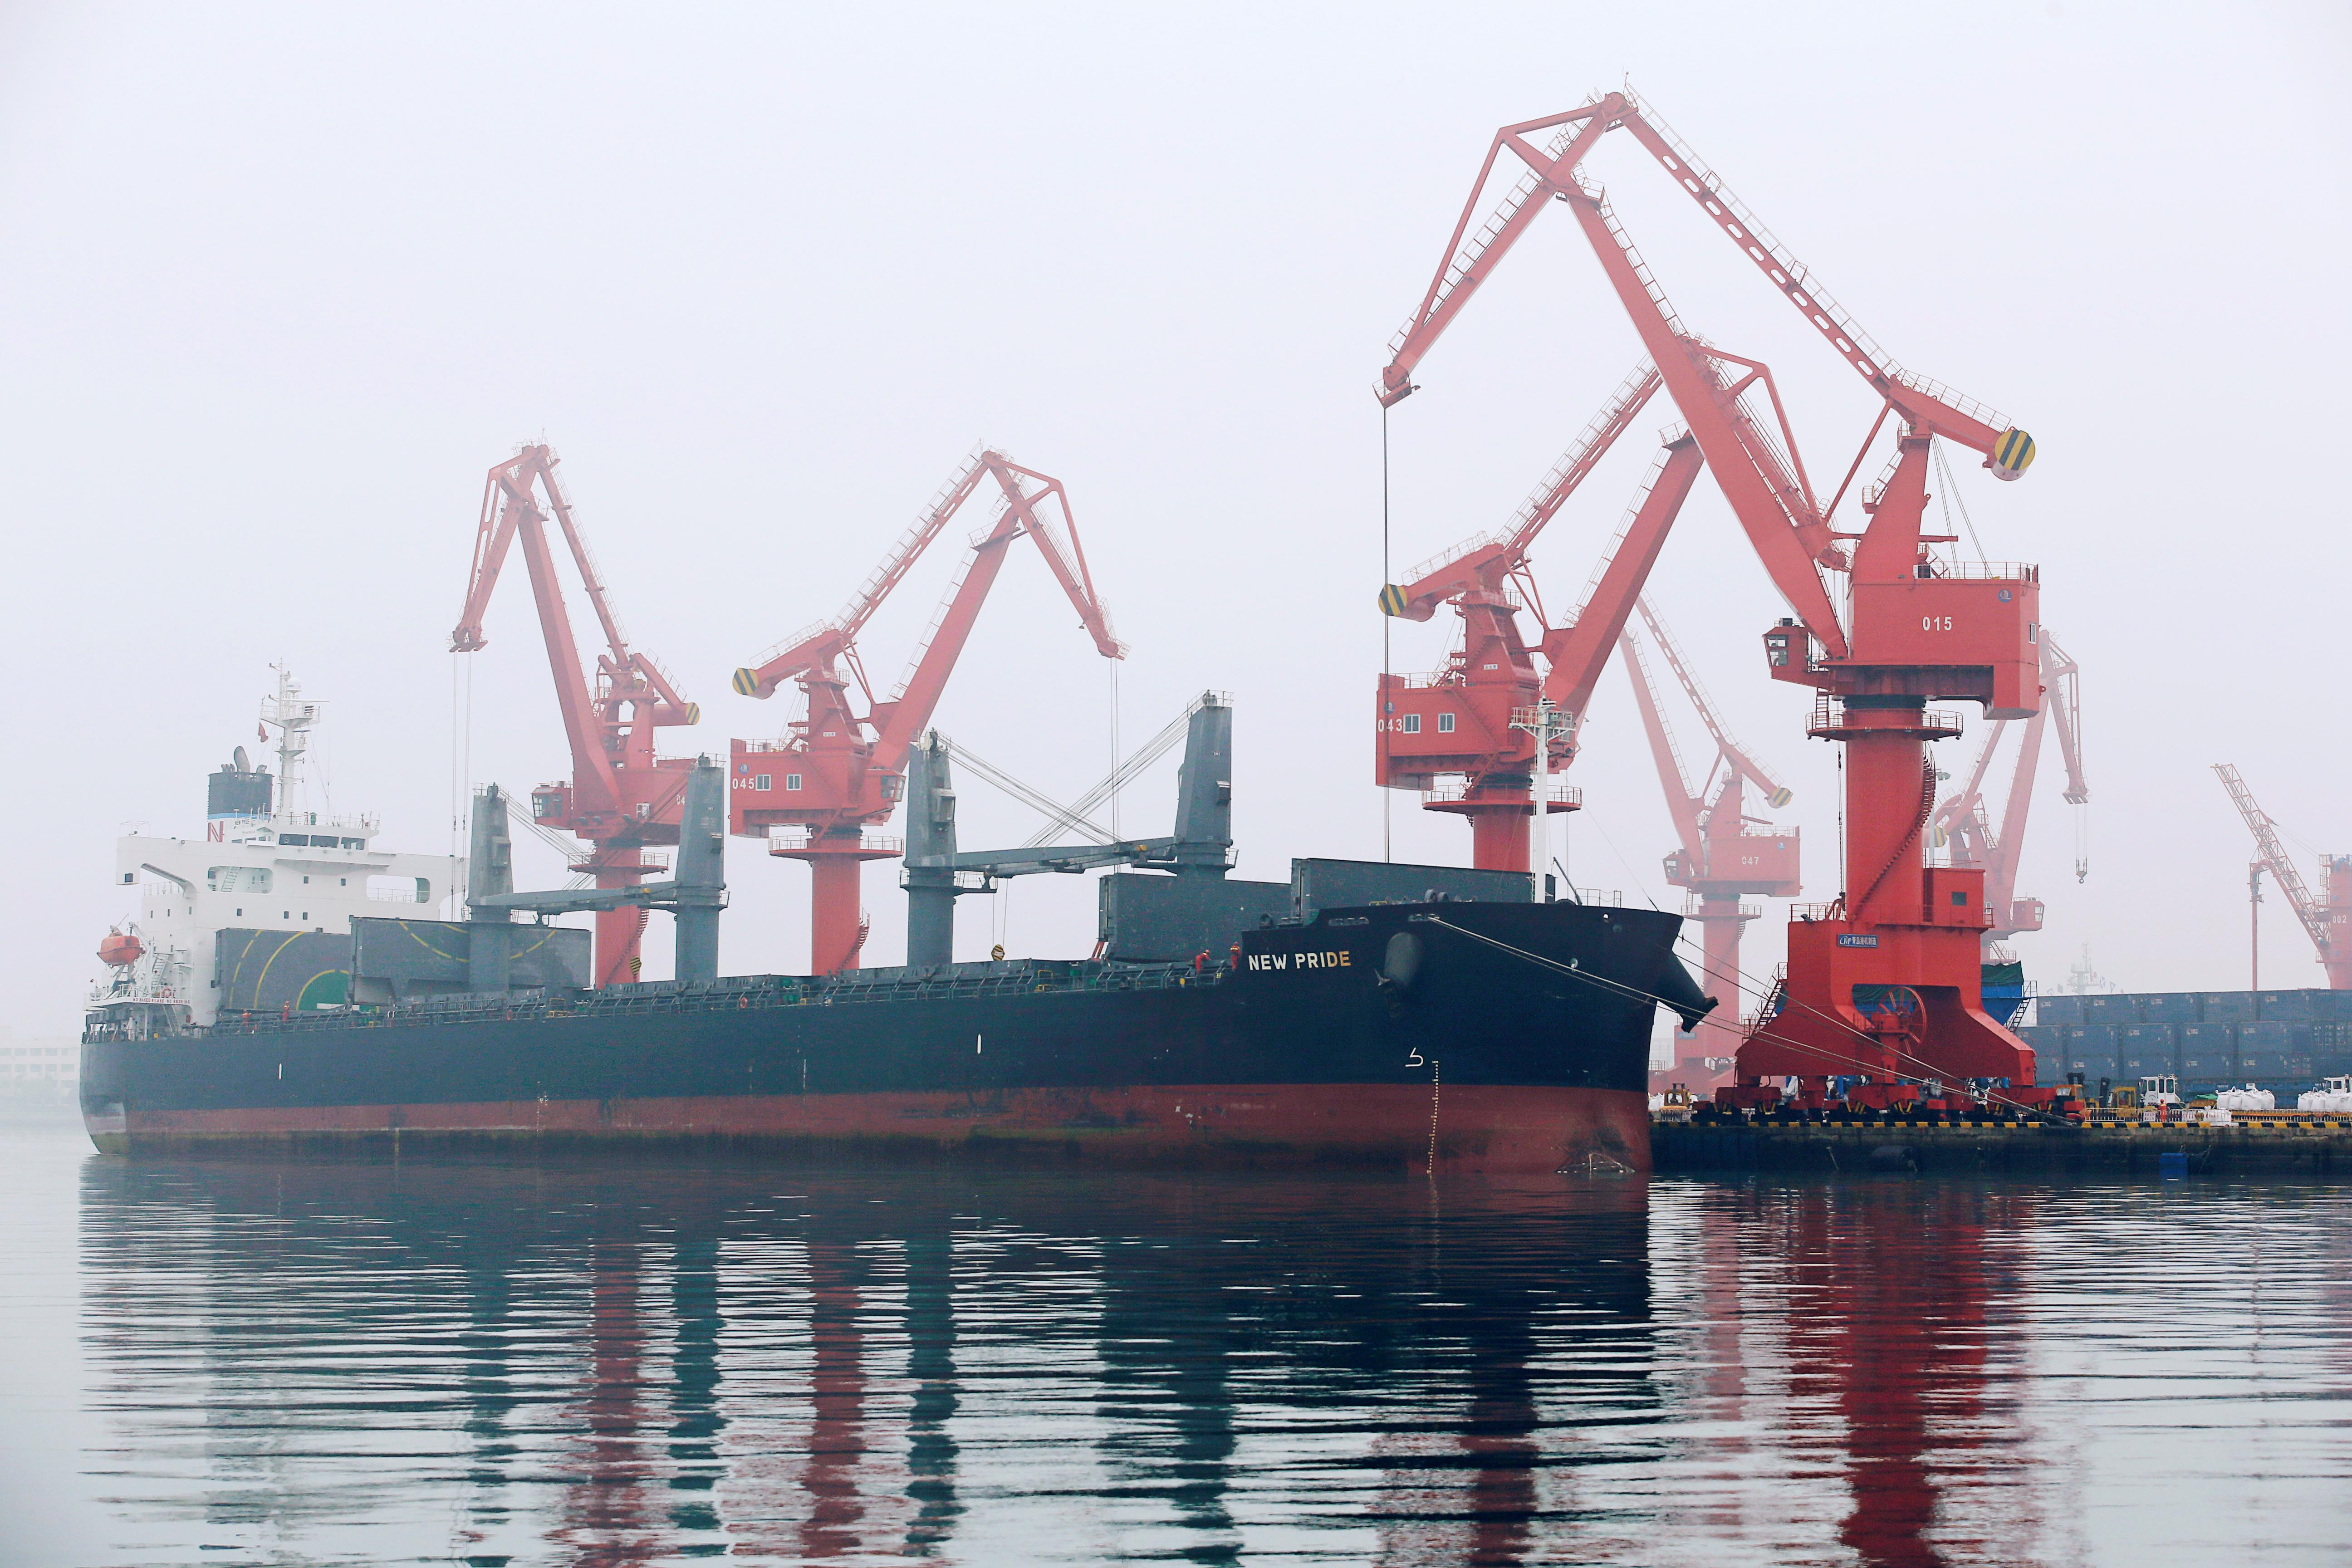 Oil prices rise on stimulus hopes, trade optimism